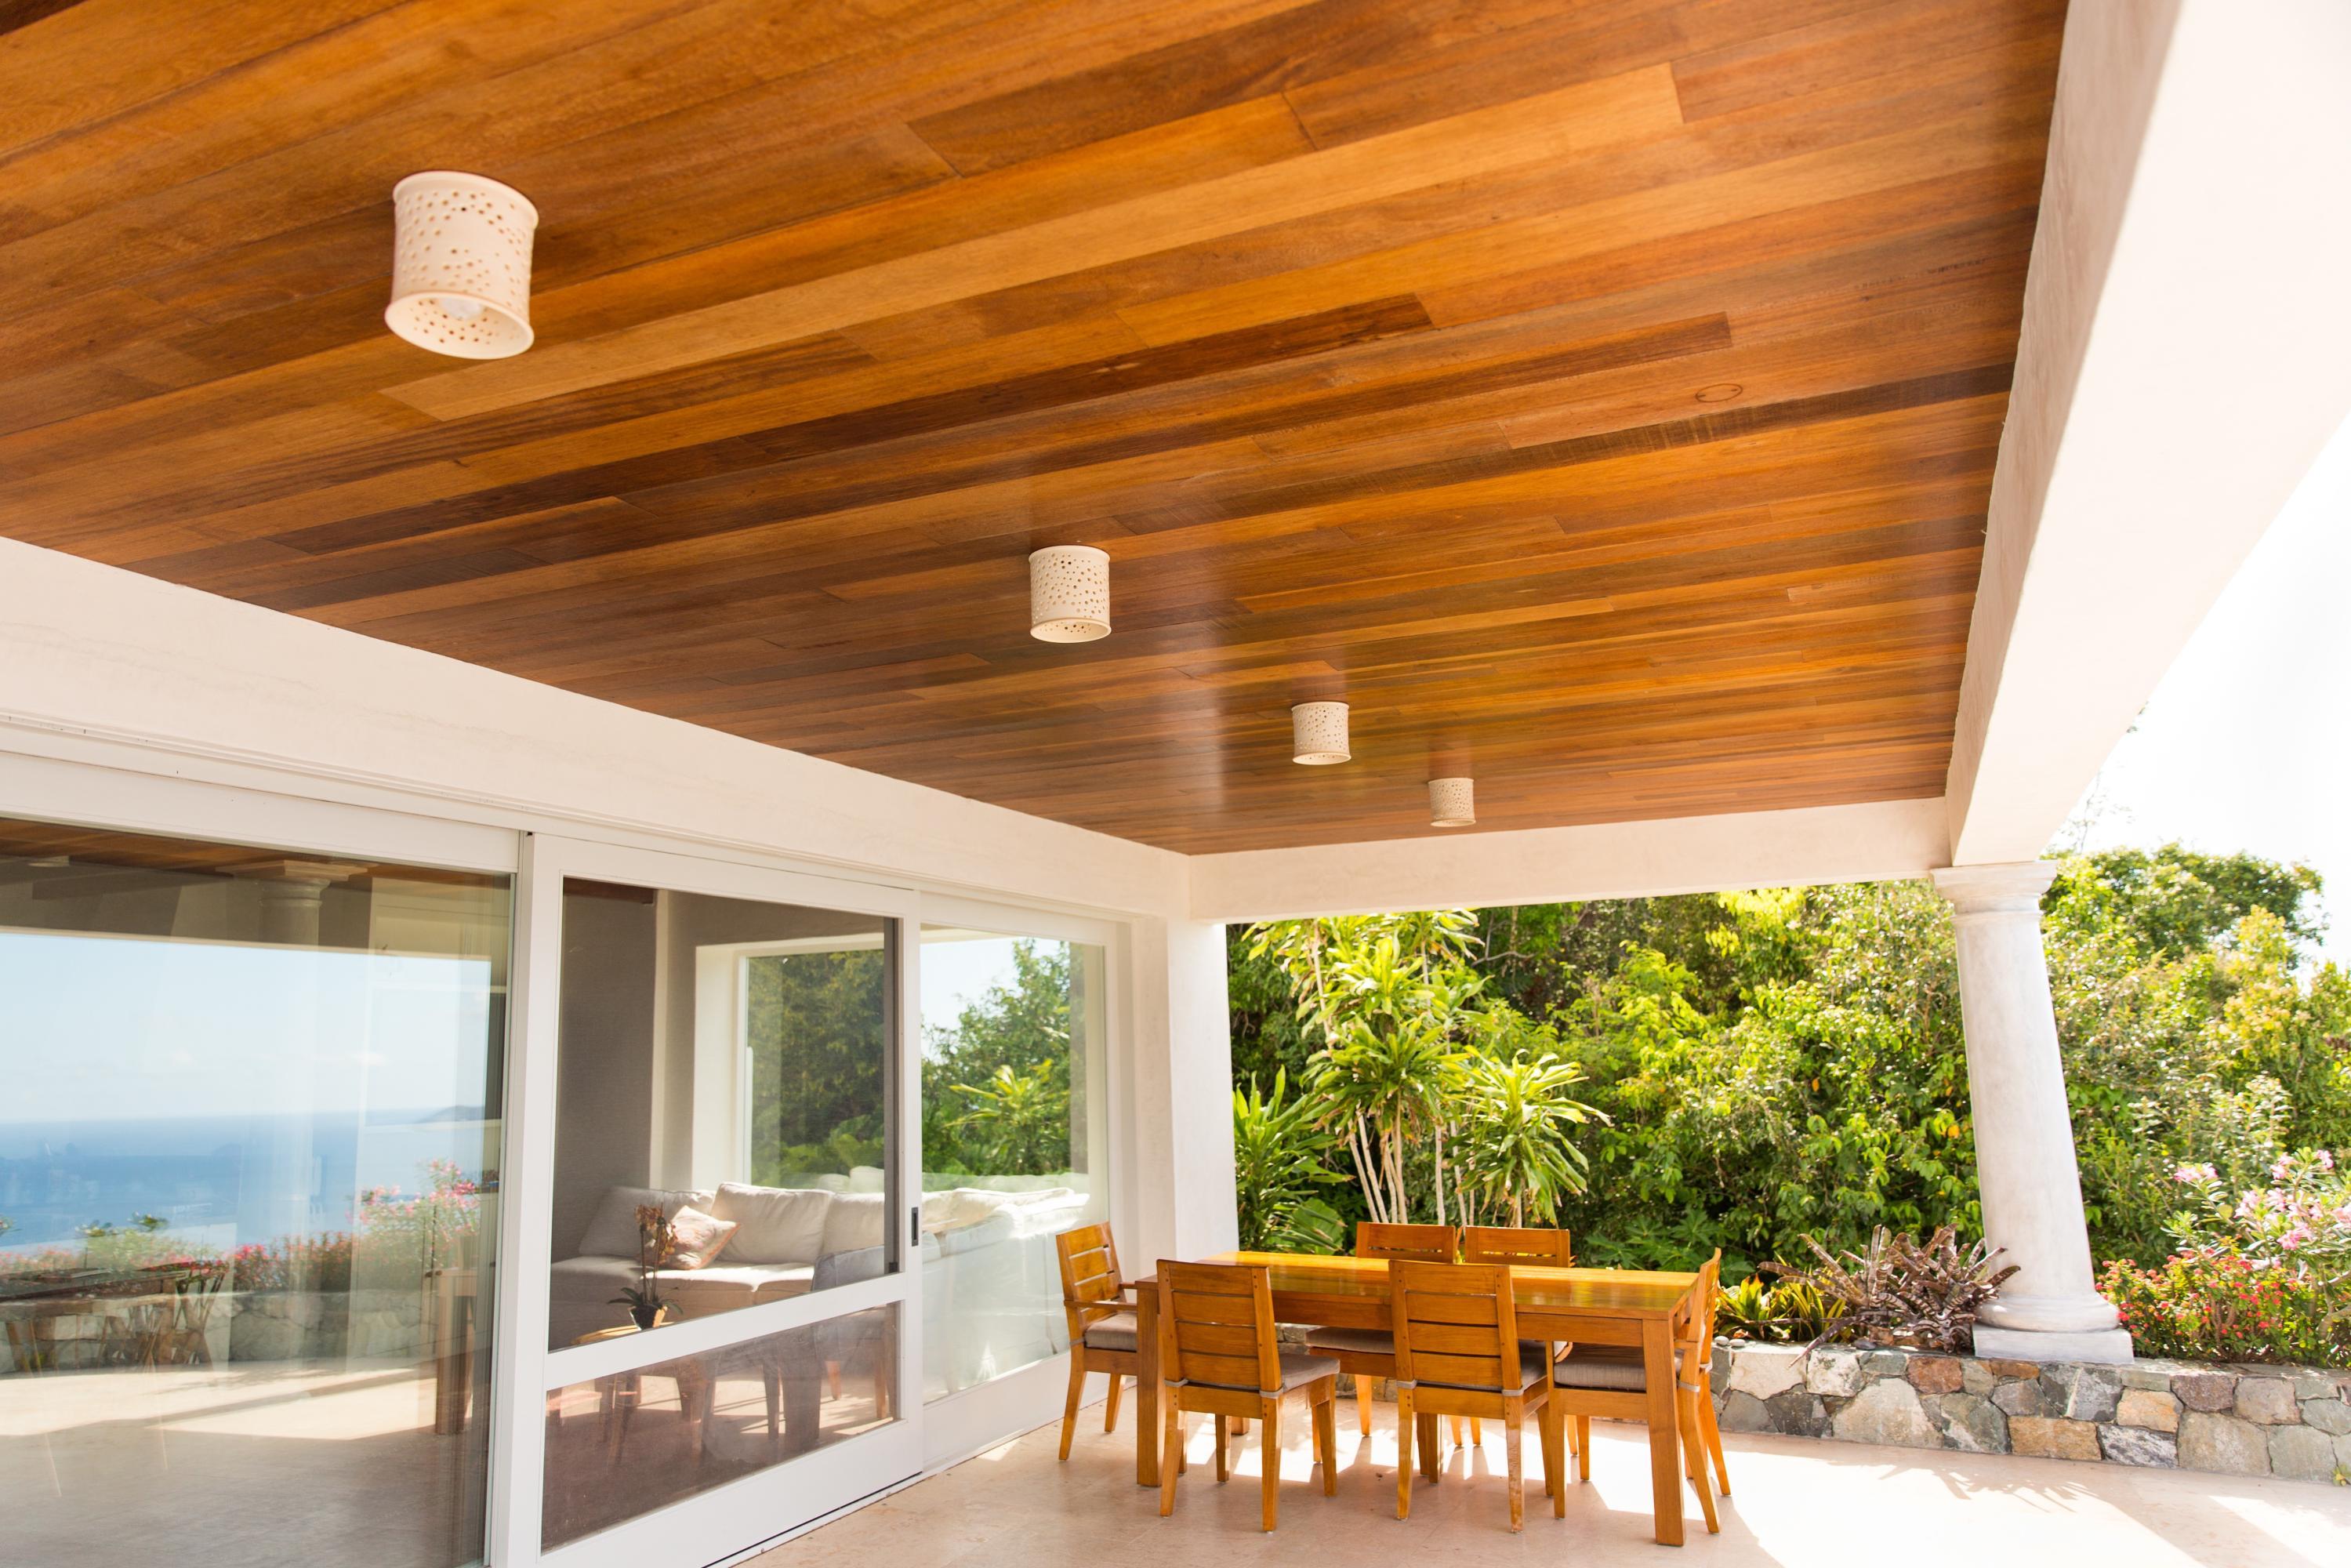 Tropical hardwood finishes throughout